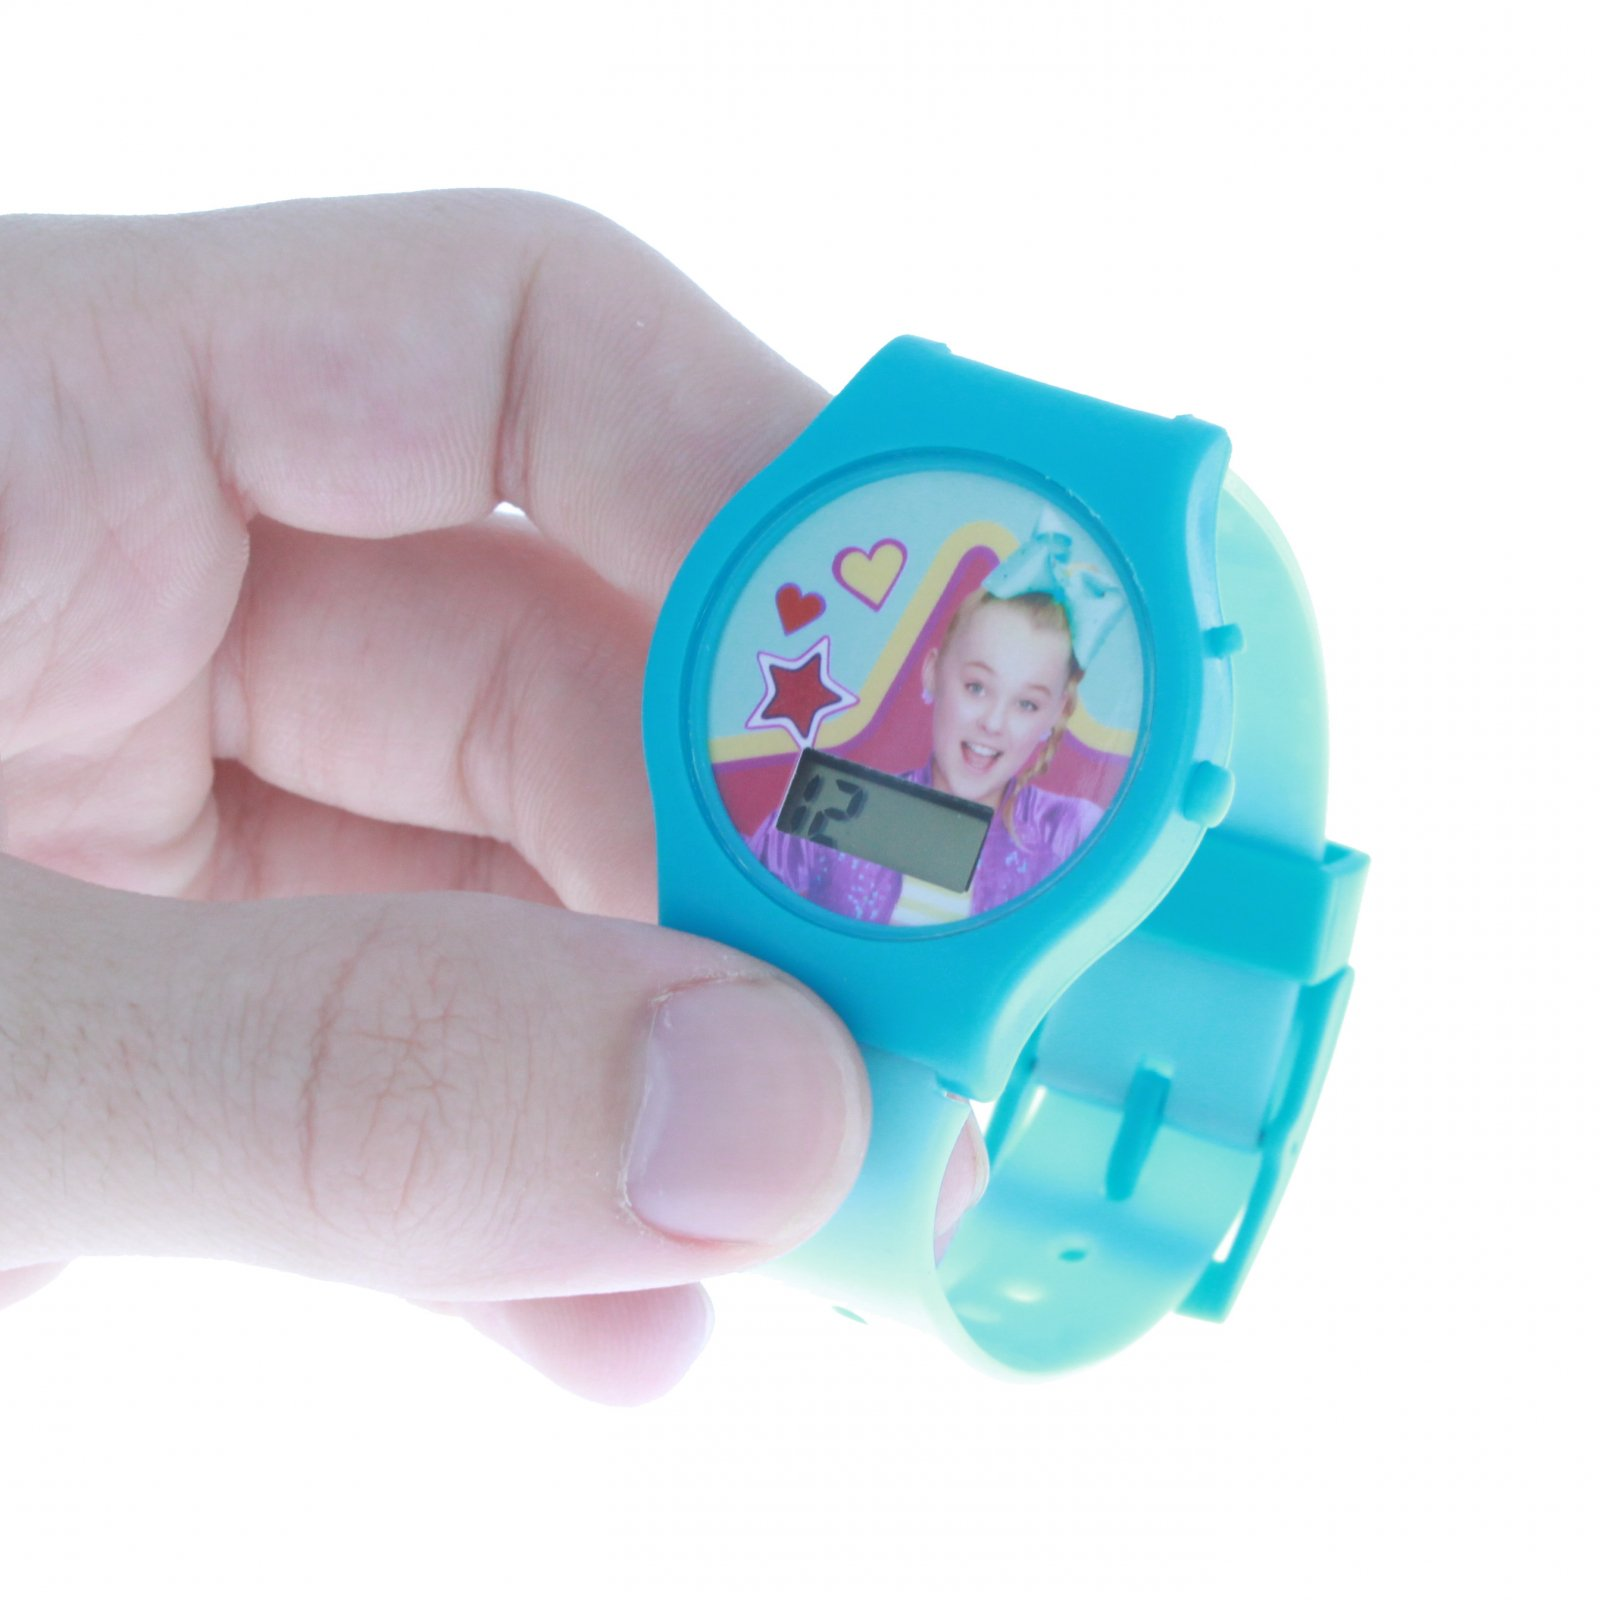 Nickelodeon JoJo Siwa LCD Digital Wrist Watch and Timer Blue